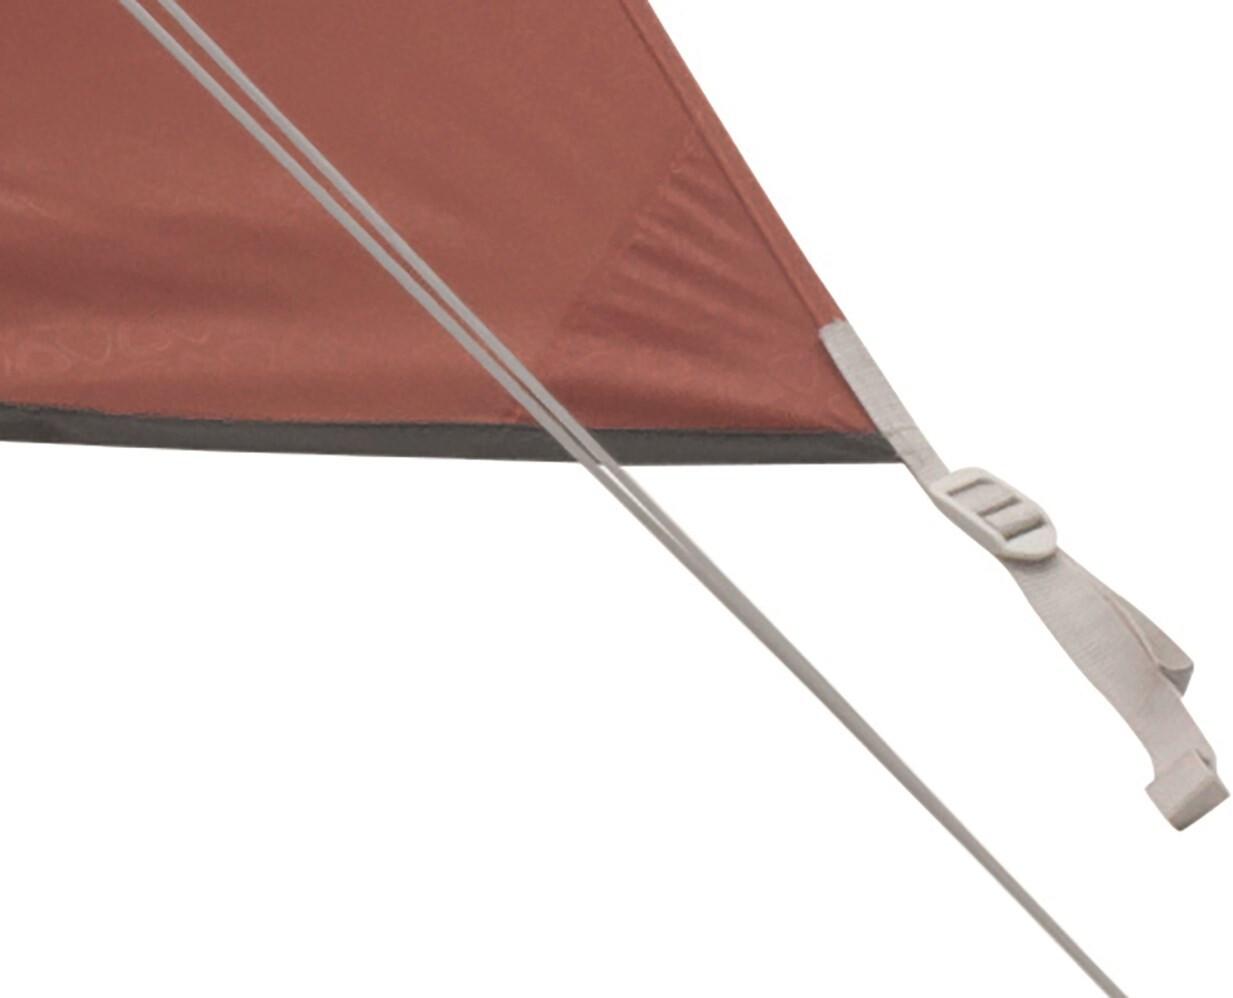 Robens tenda aringhe snow and sabbia per pavimenti senza 2er blisterpack ROSSO tenda aringhe Z